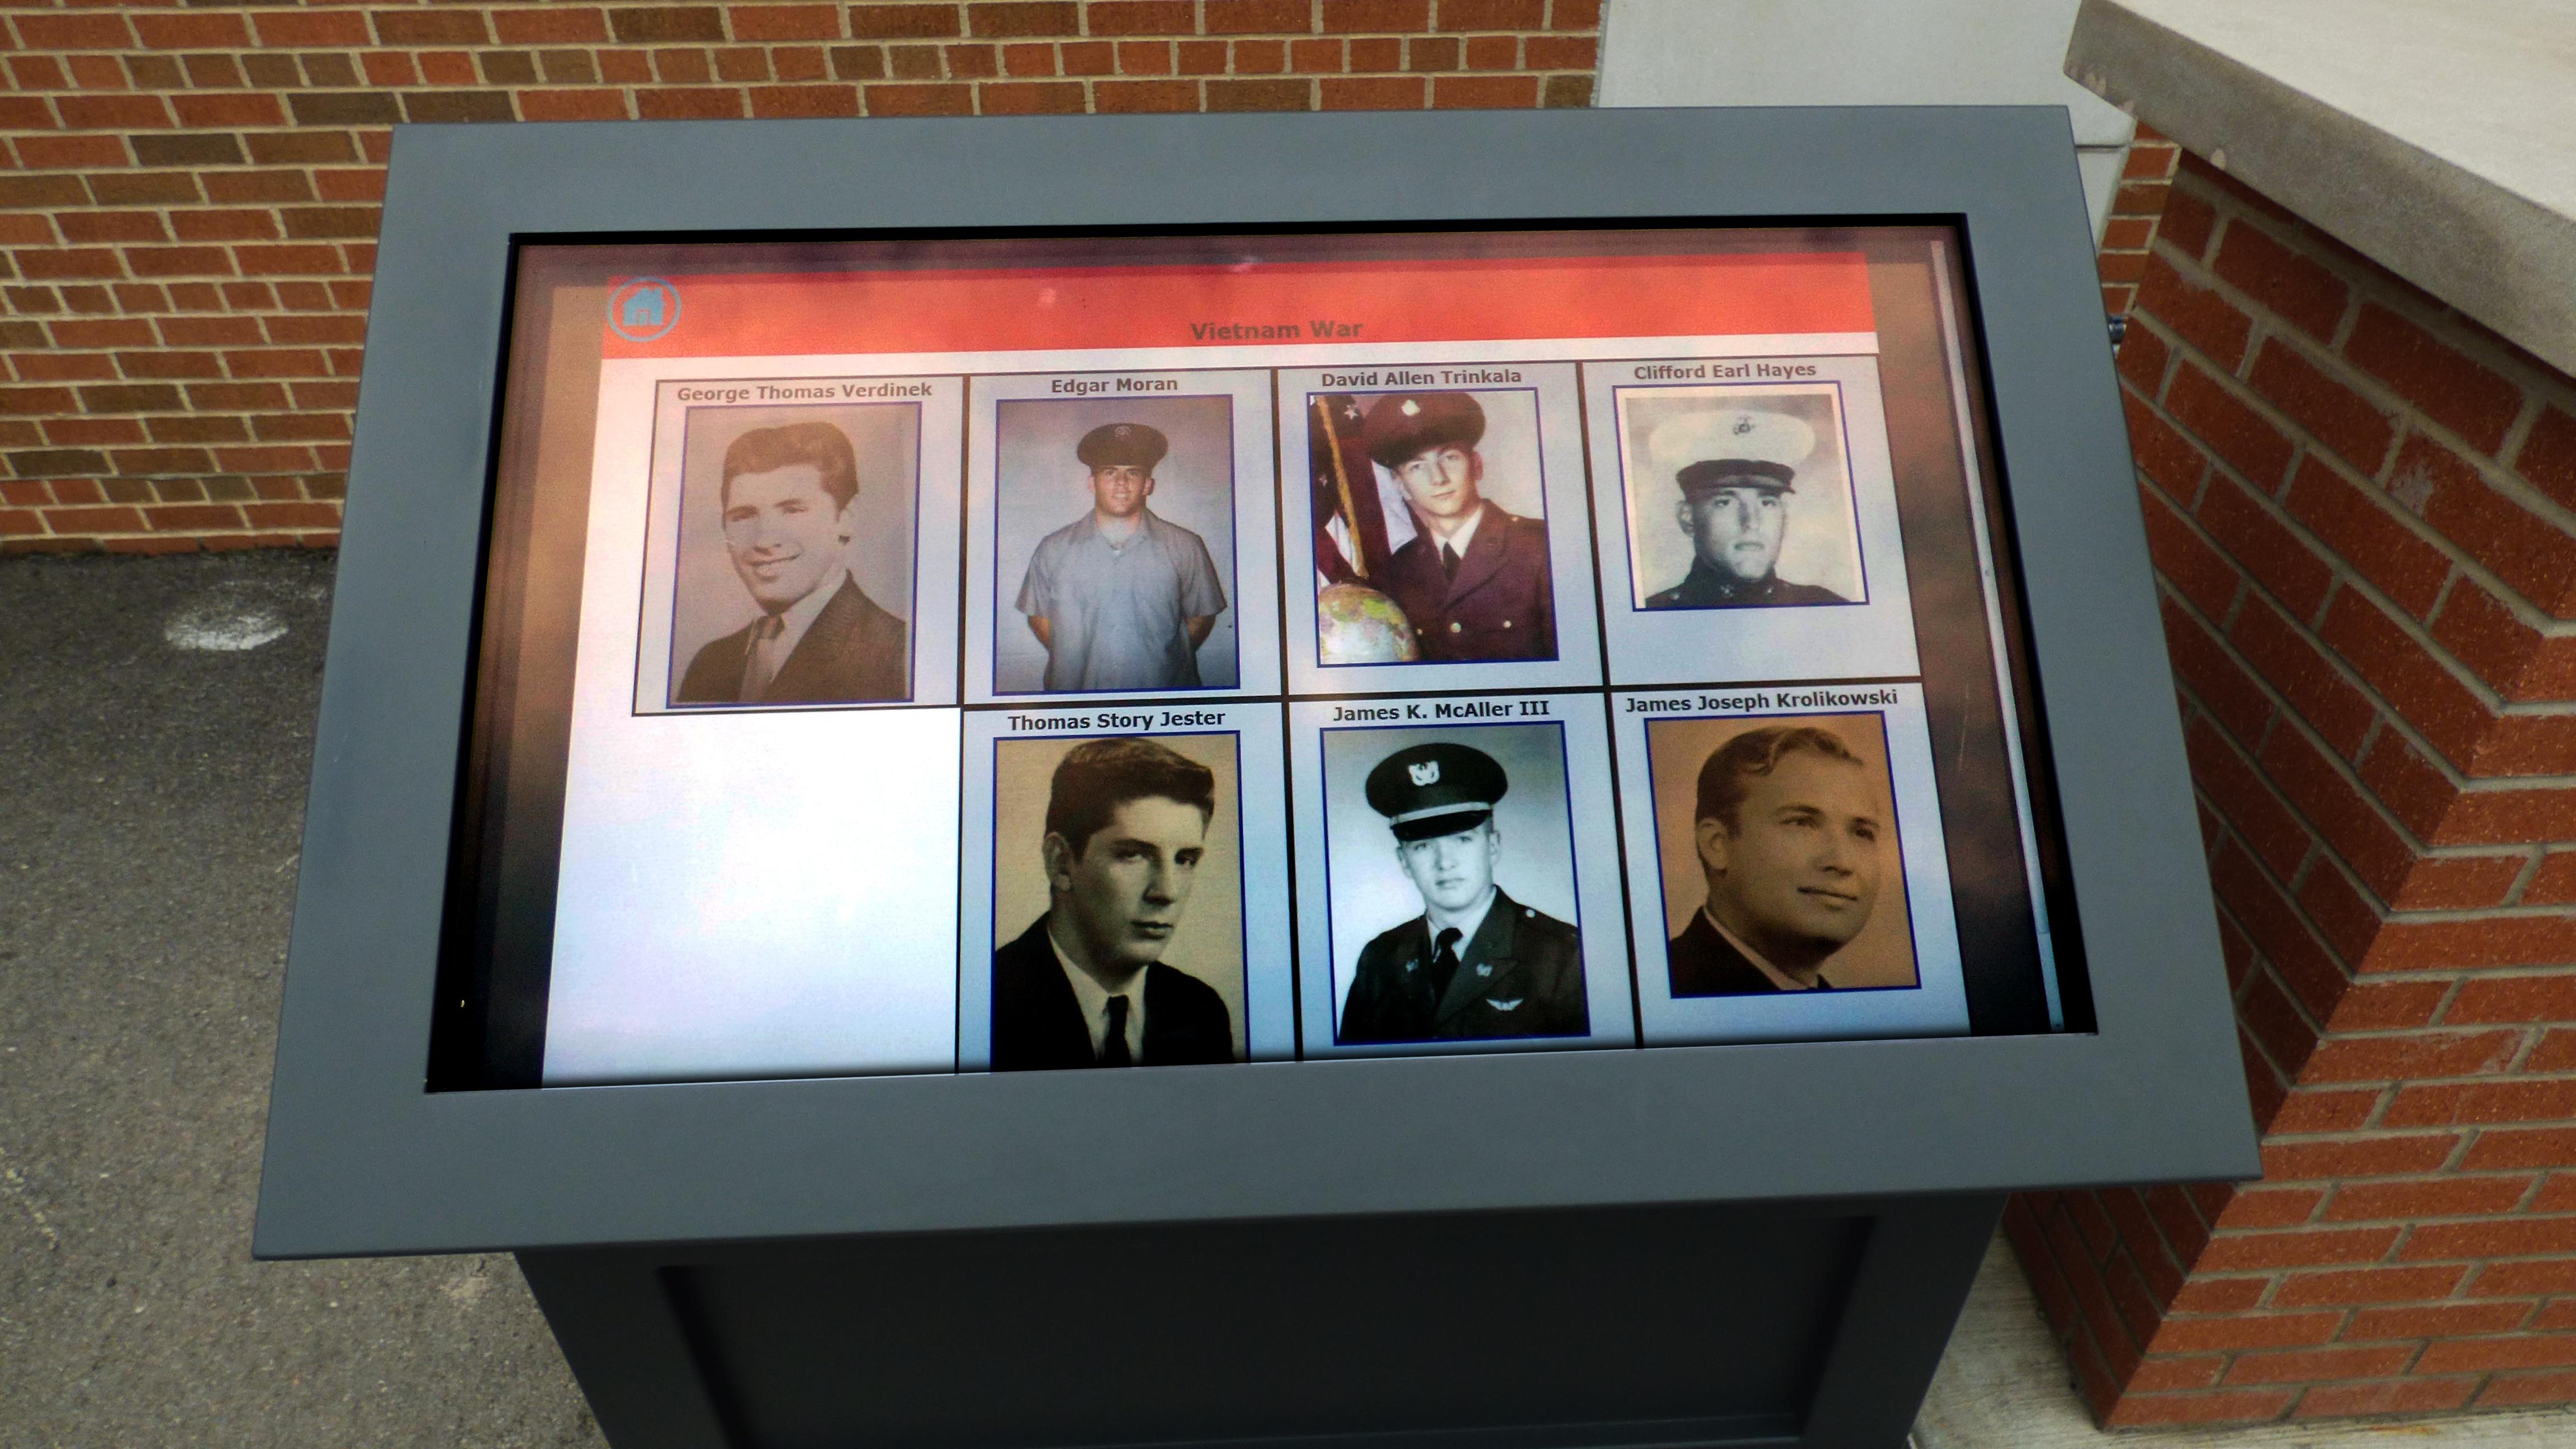 chartiers valley school district viewstation itsenclosures kiosk digital signage.jpg